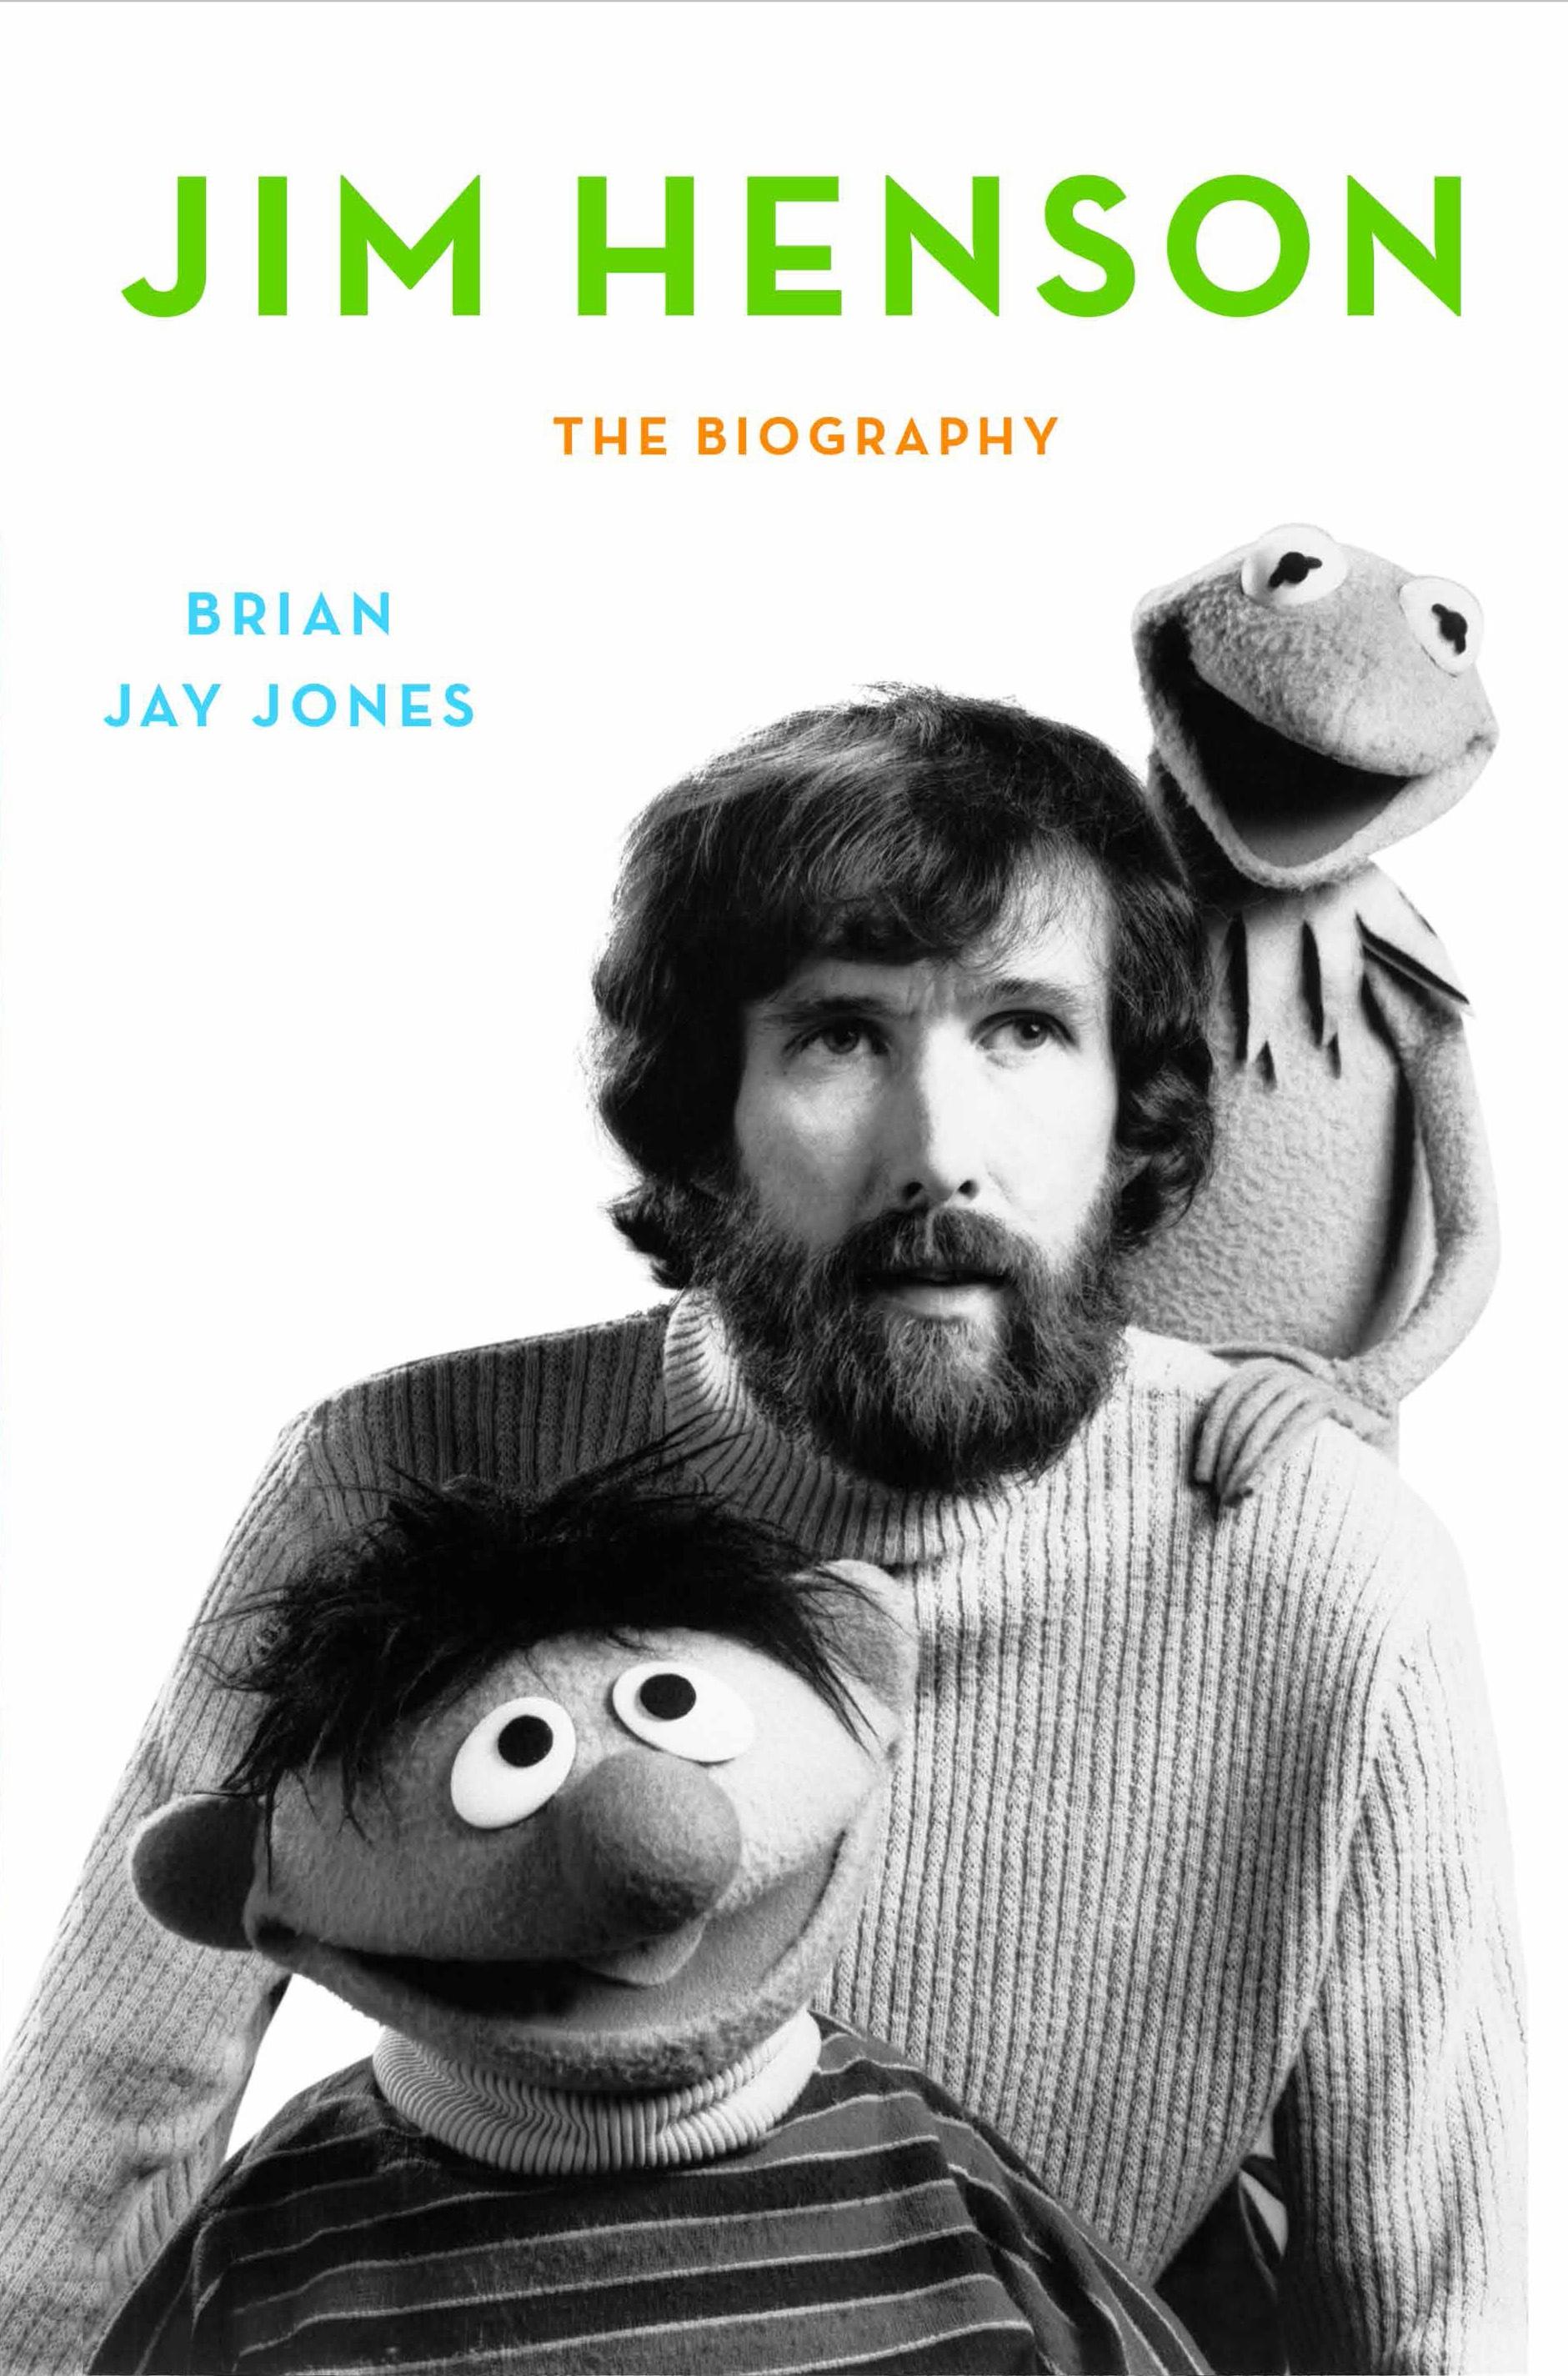 Jimhenson Biographycover